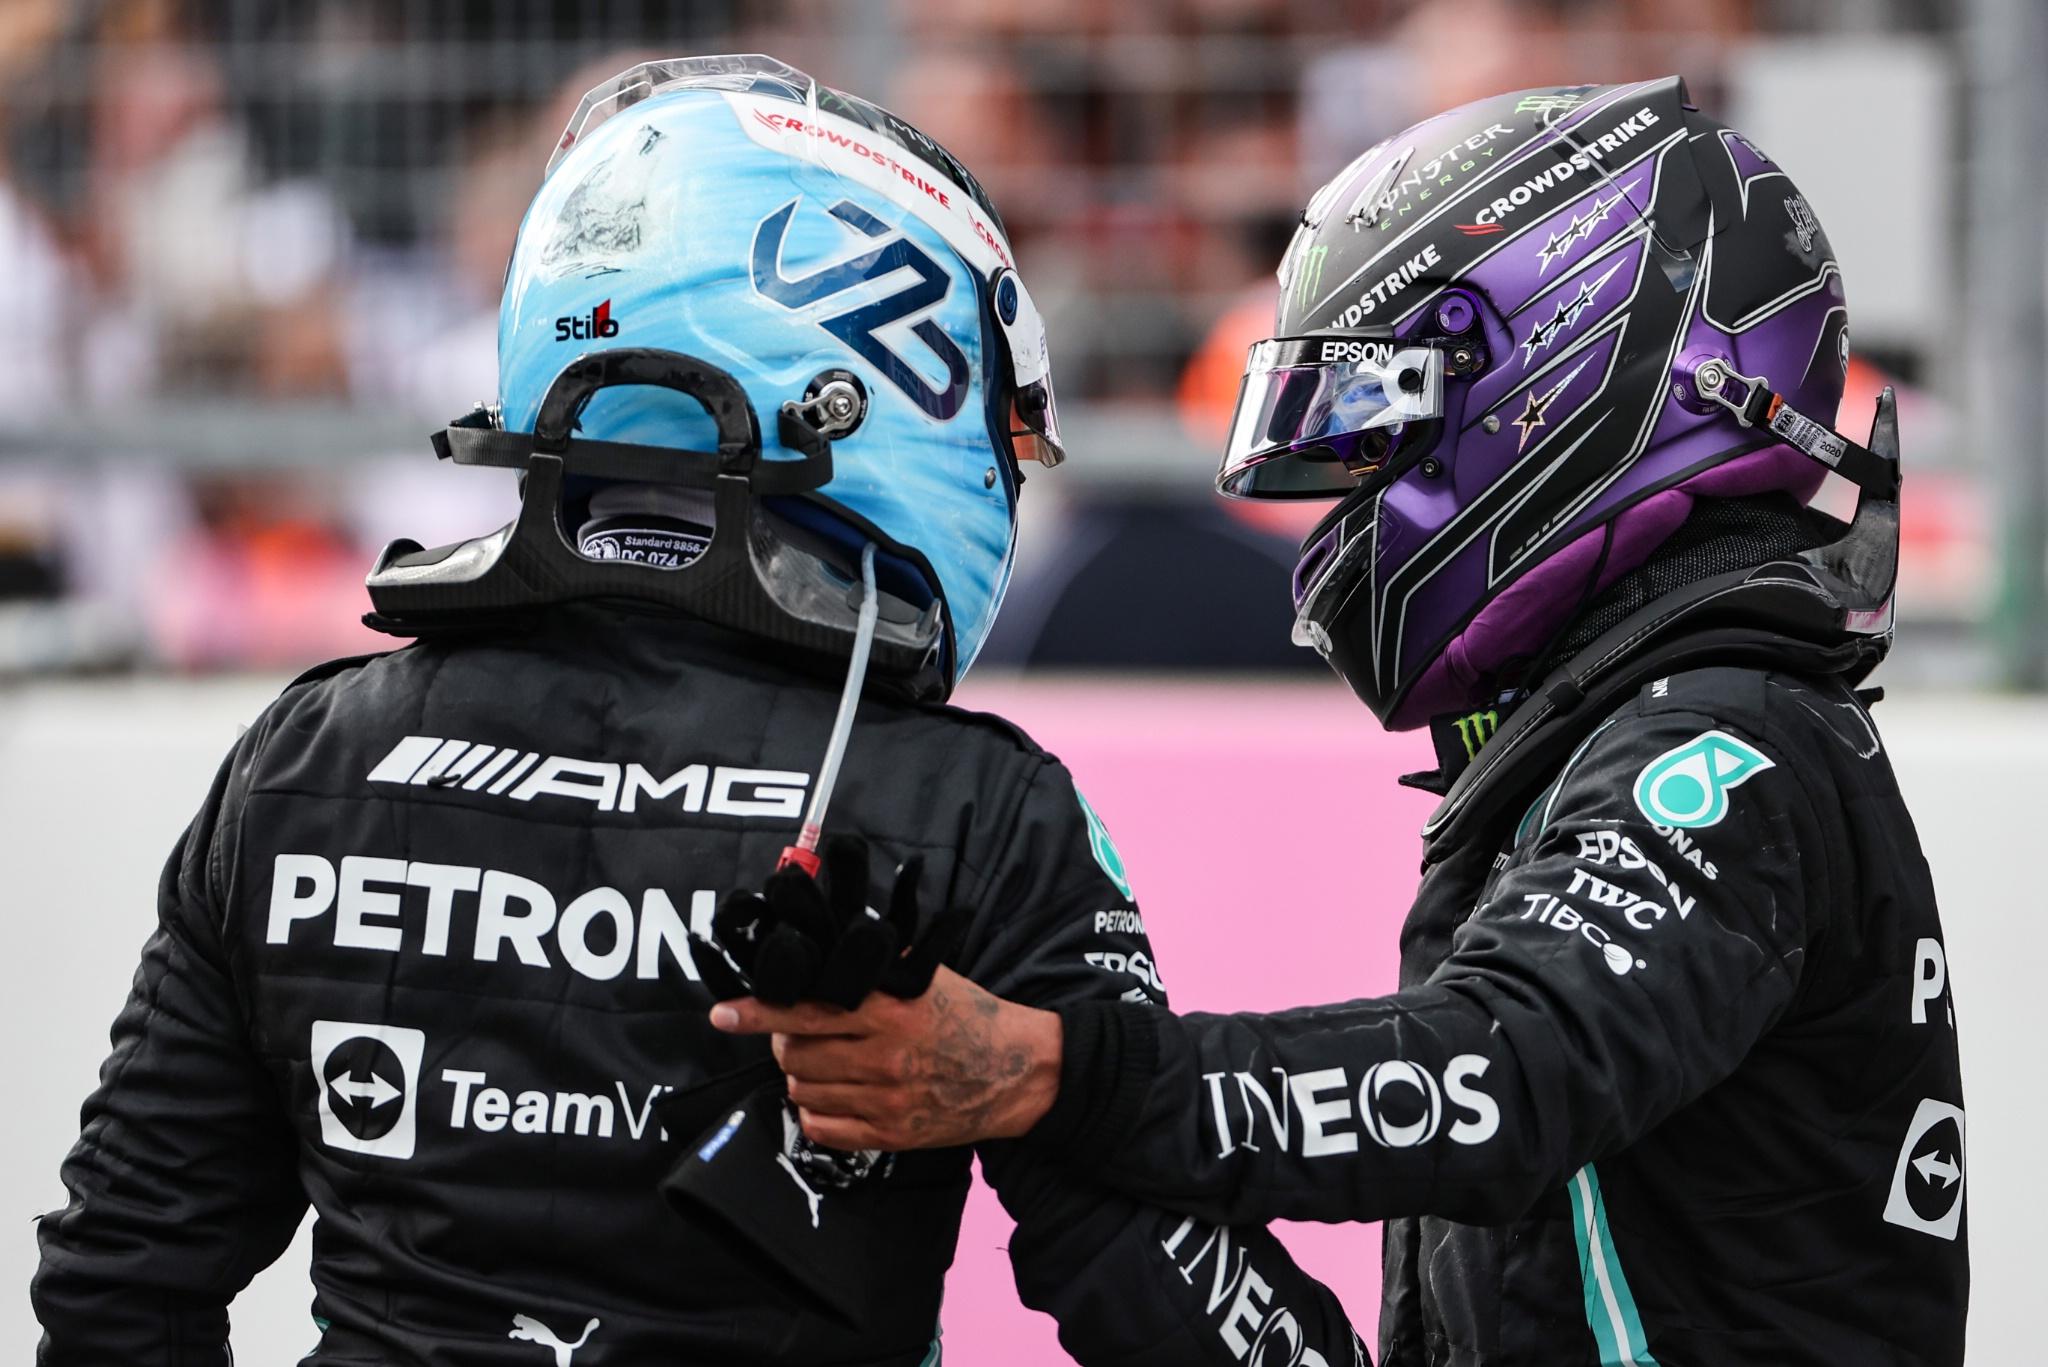 Valtteri Bottas (FIN), Mercedes AMG F1 and Lewis Hamilton (GBR), Mercedes AMG F1